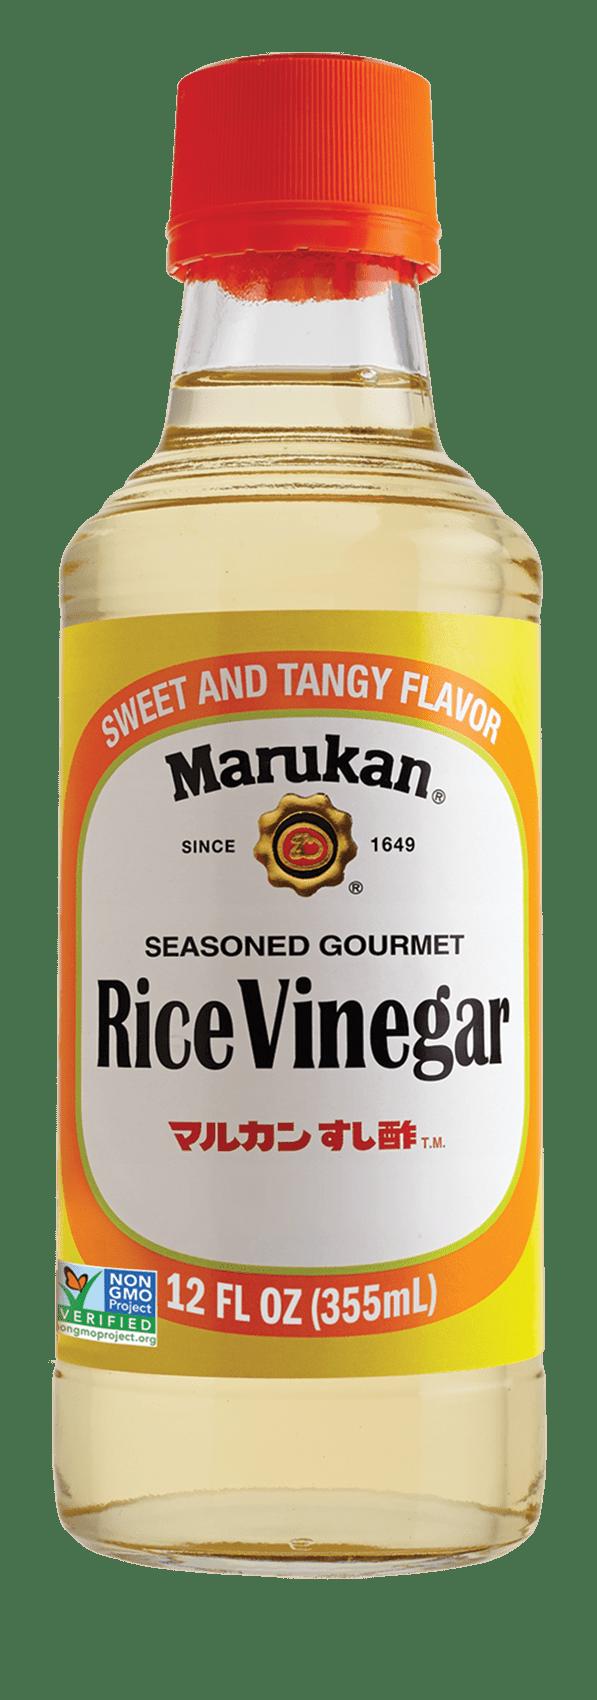 Seasoned Gourmet Rice Vinegar